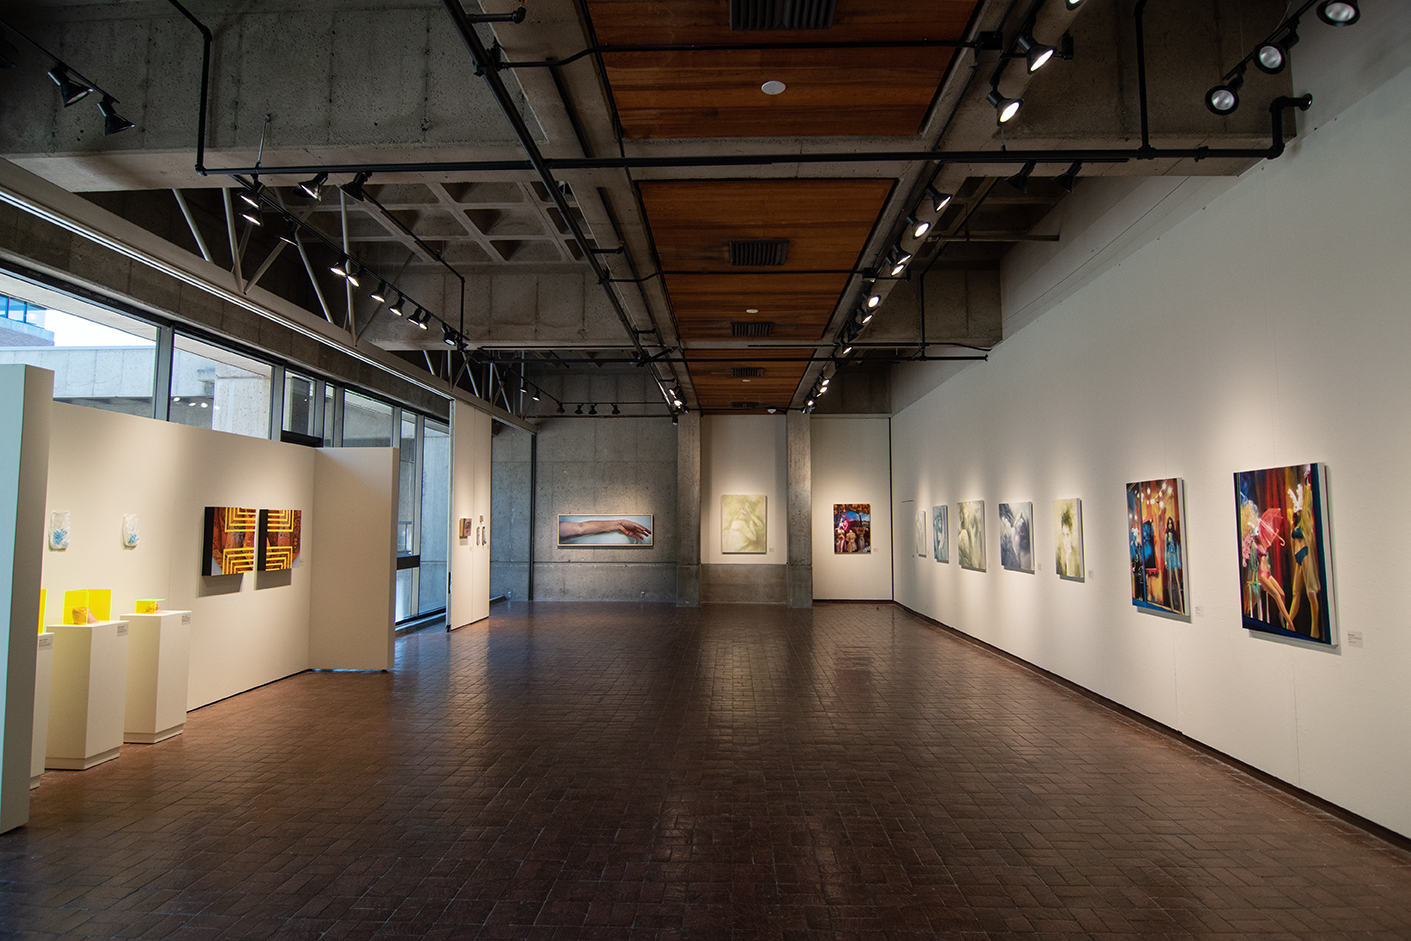 Howard Clark Scholarship Exhibition Gittins Gallery, August 2019 artwork: Alyssa Hood, Lucy Le Bohec, and Alexis Rausch